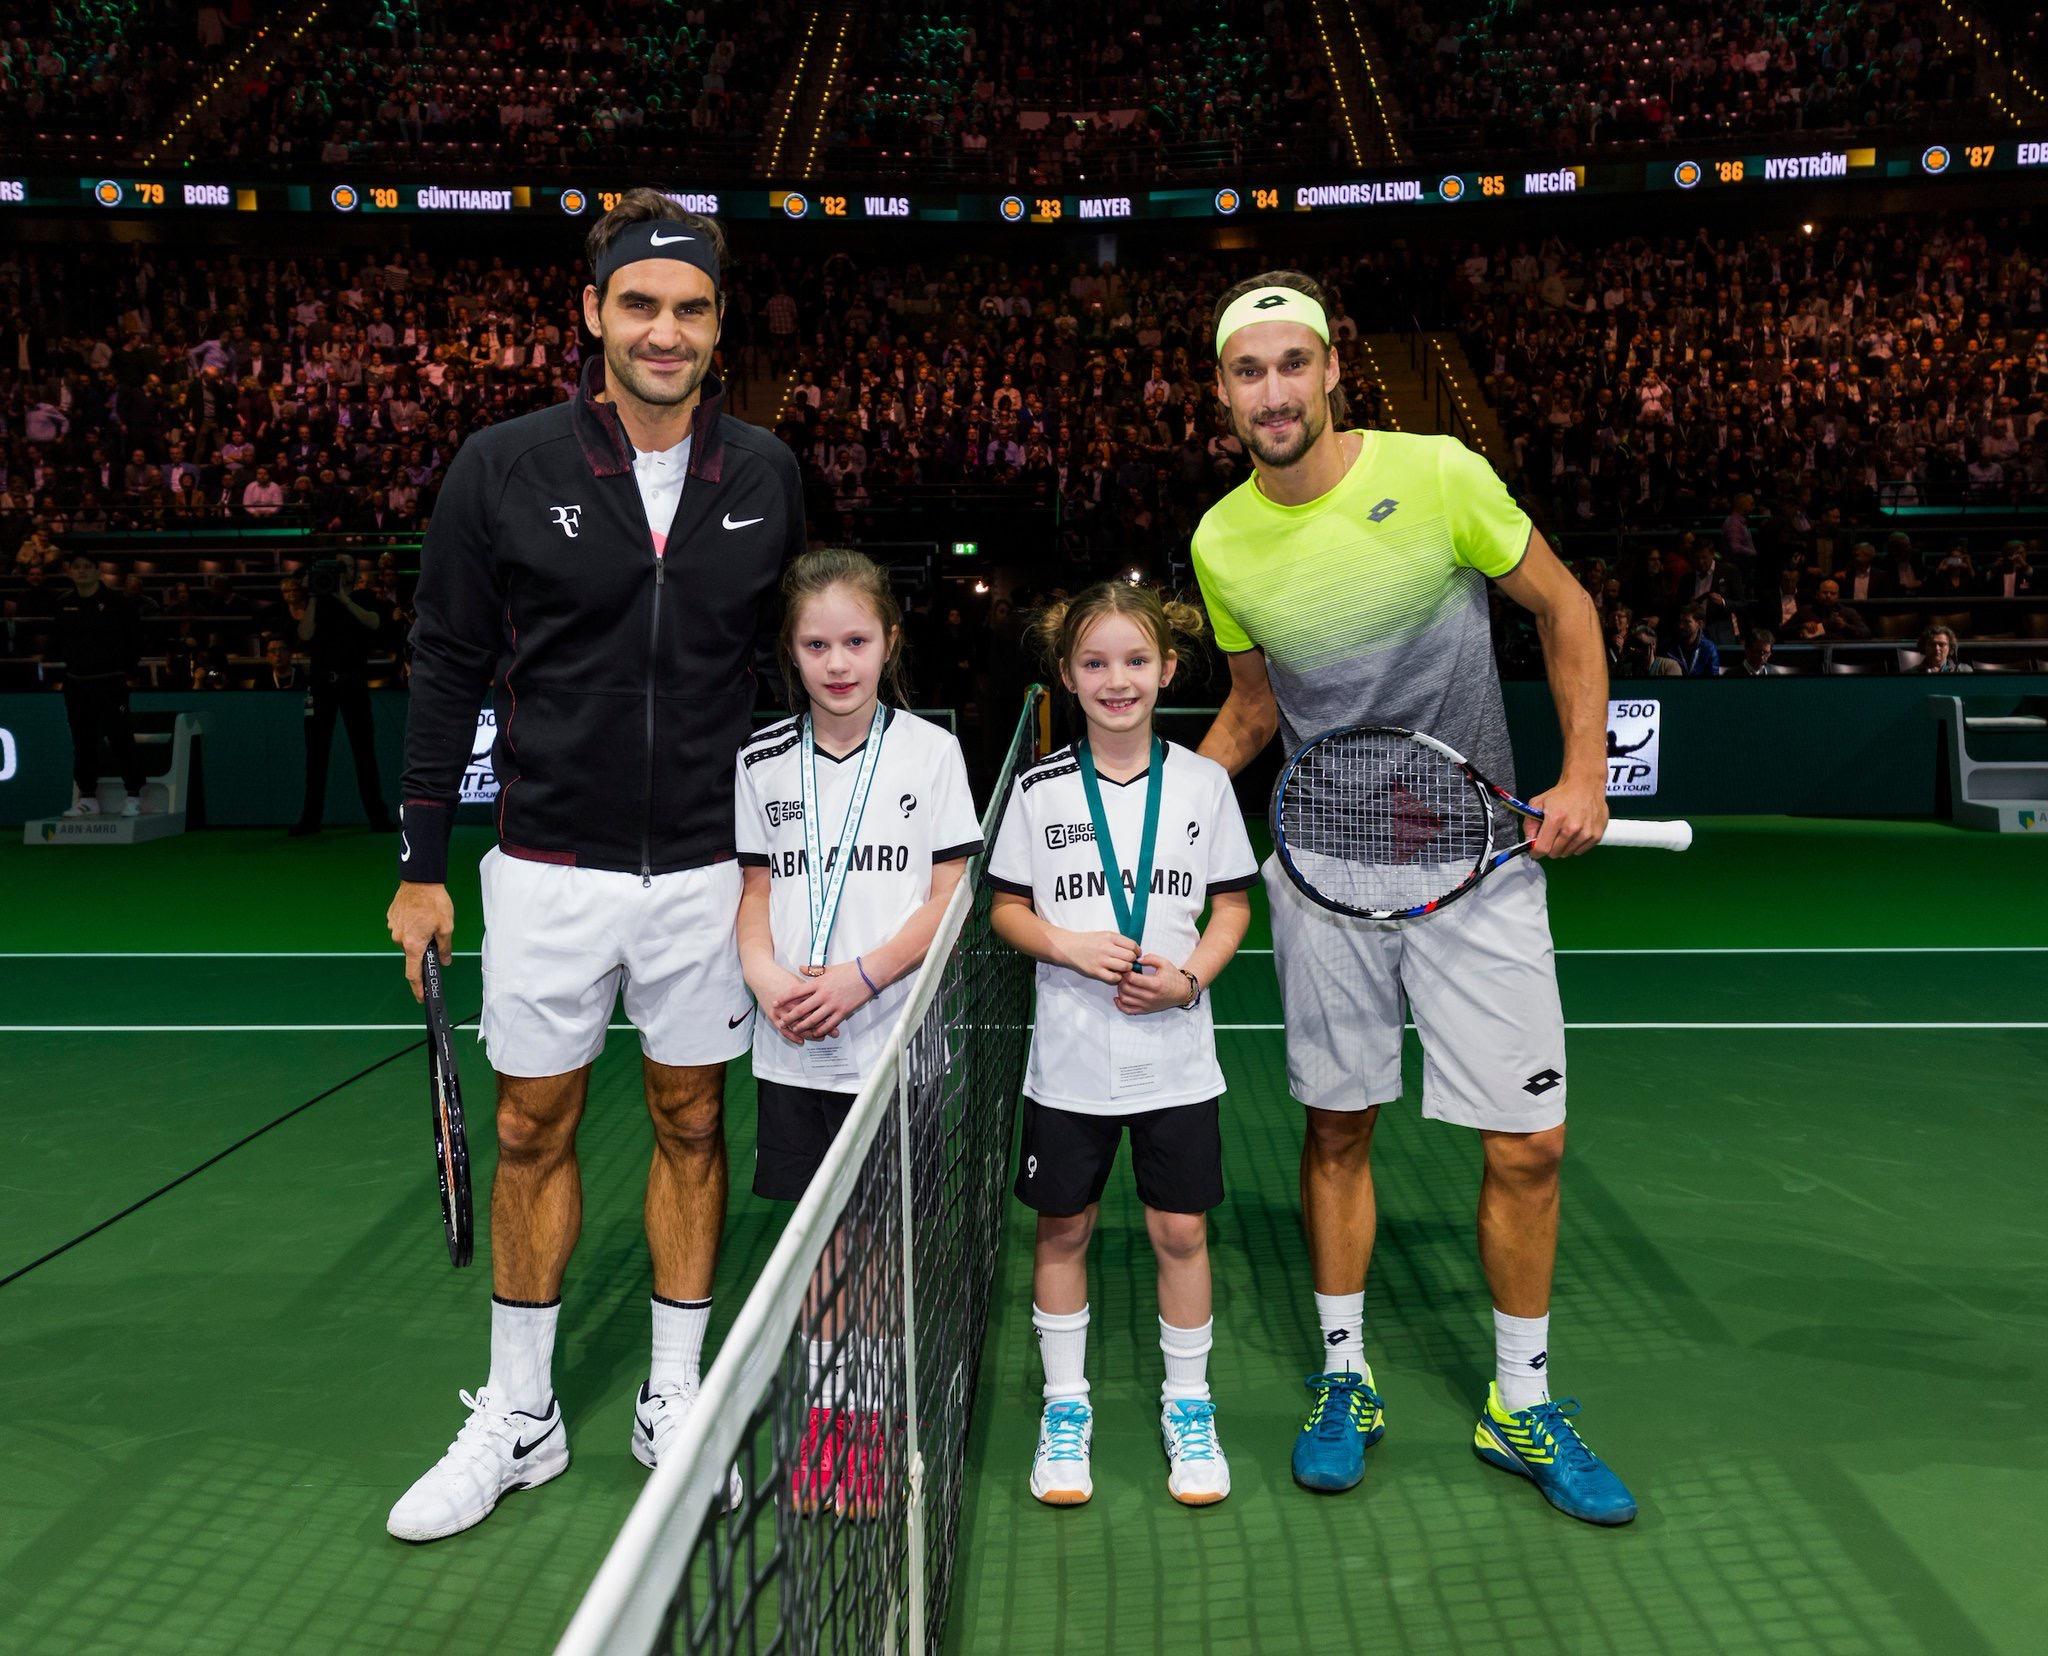 Roger Federer 2018 Rotterdam Open - ABN AMRO World Tennis Tournament - Federer Wins Rotterdam Opener